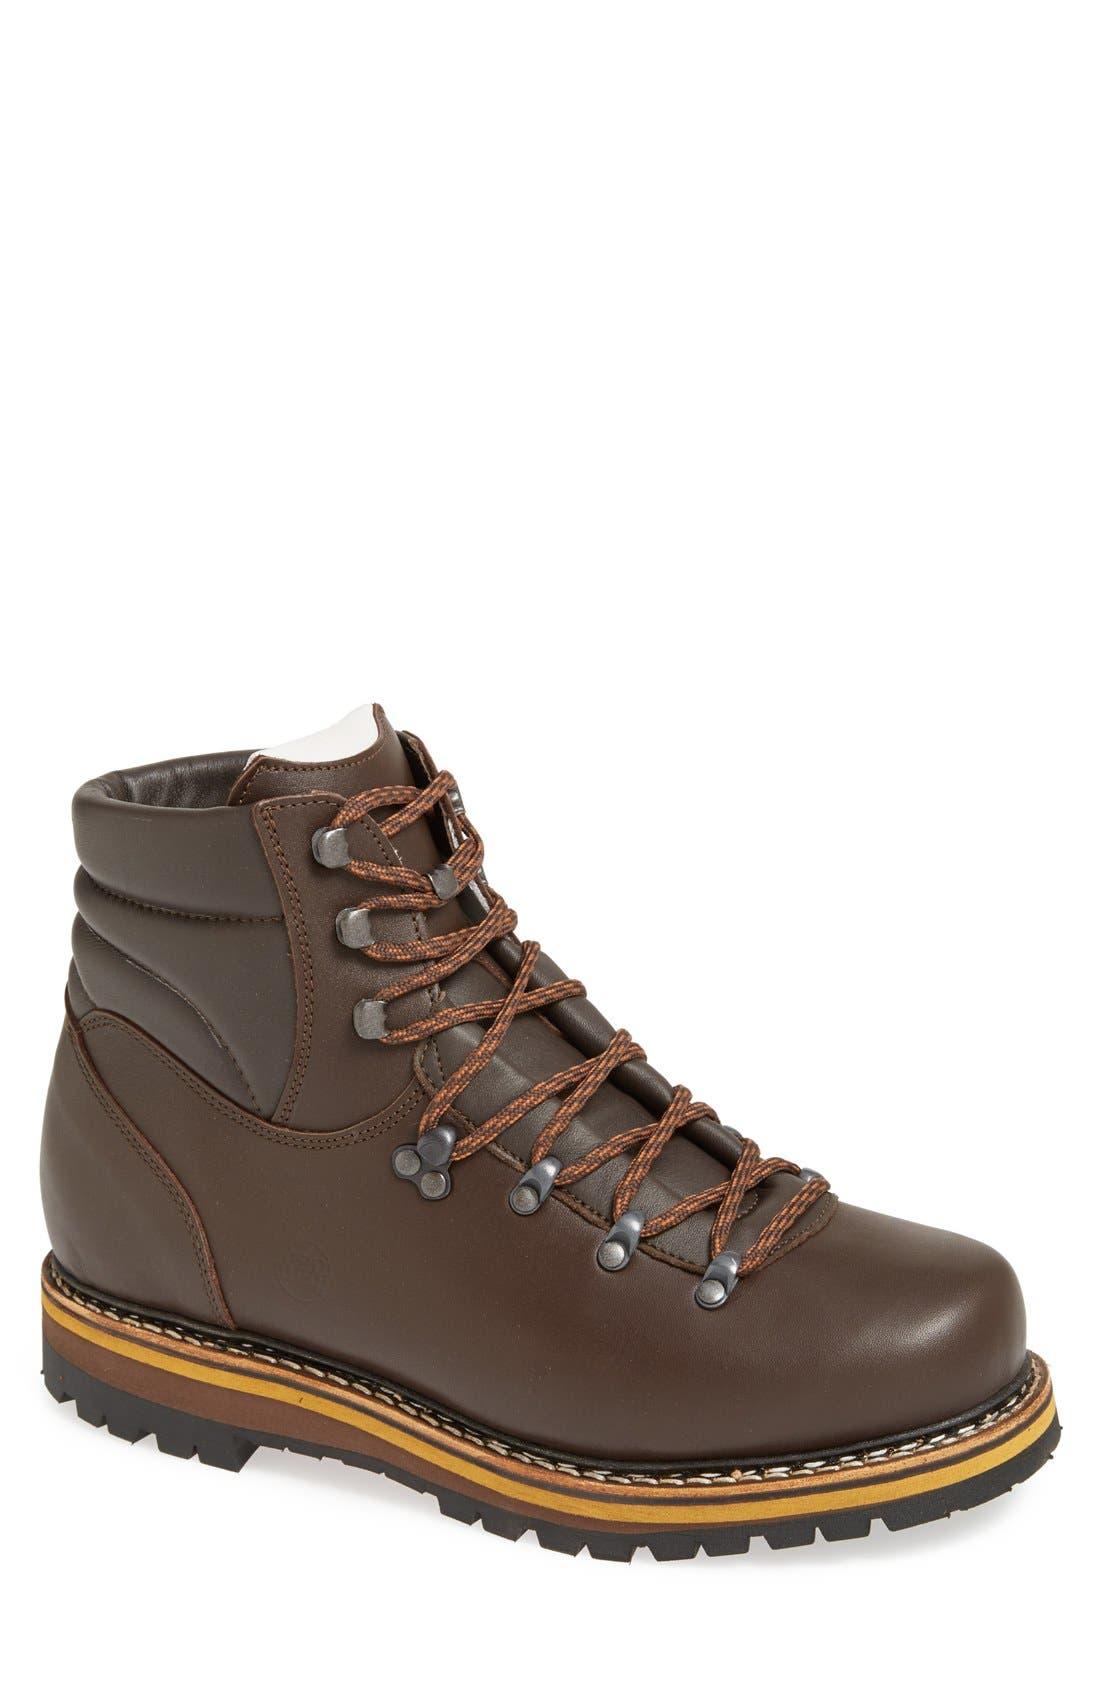 Alternate Image 1 Selected - Hanwag 'Grunten' Hiking Boot (Men)